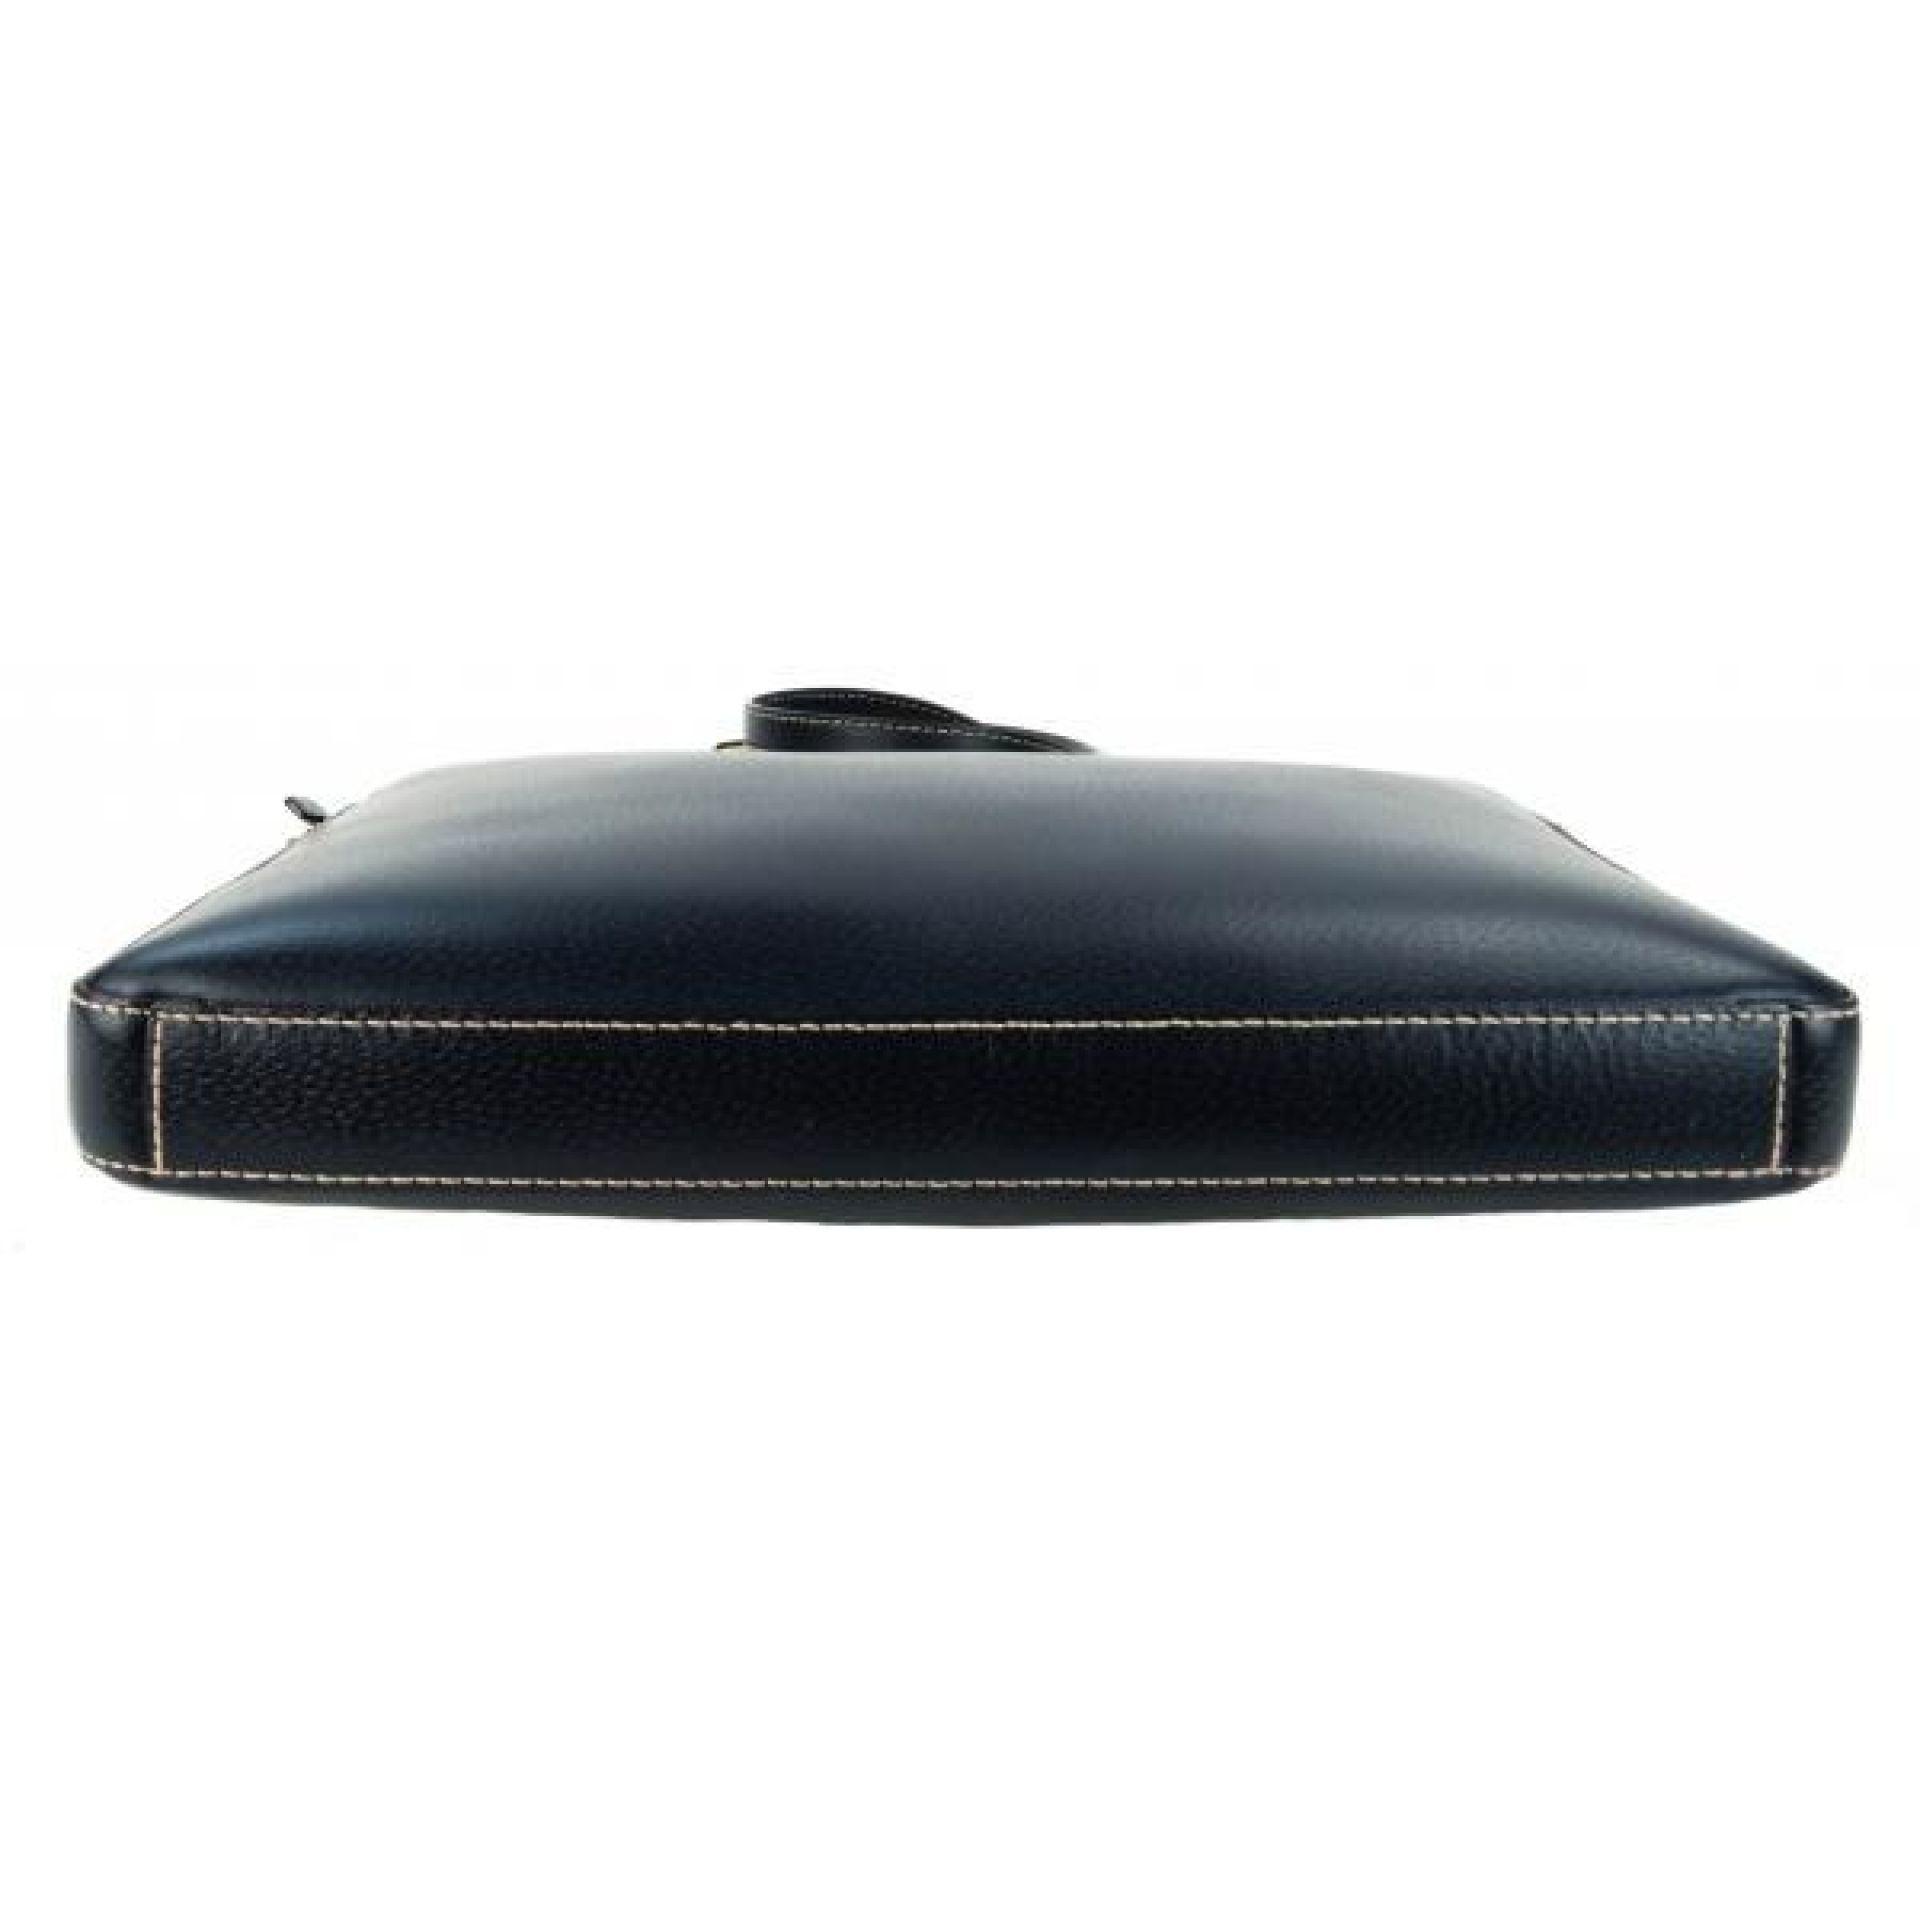 Kate Spade Navy Blue Leather Wellesley Tanner Laptop Bag